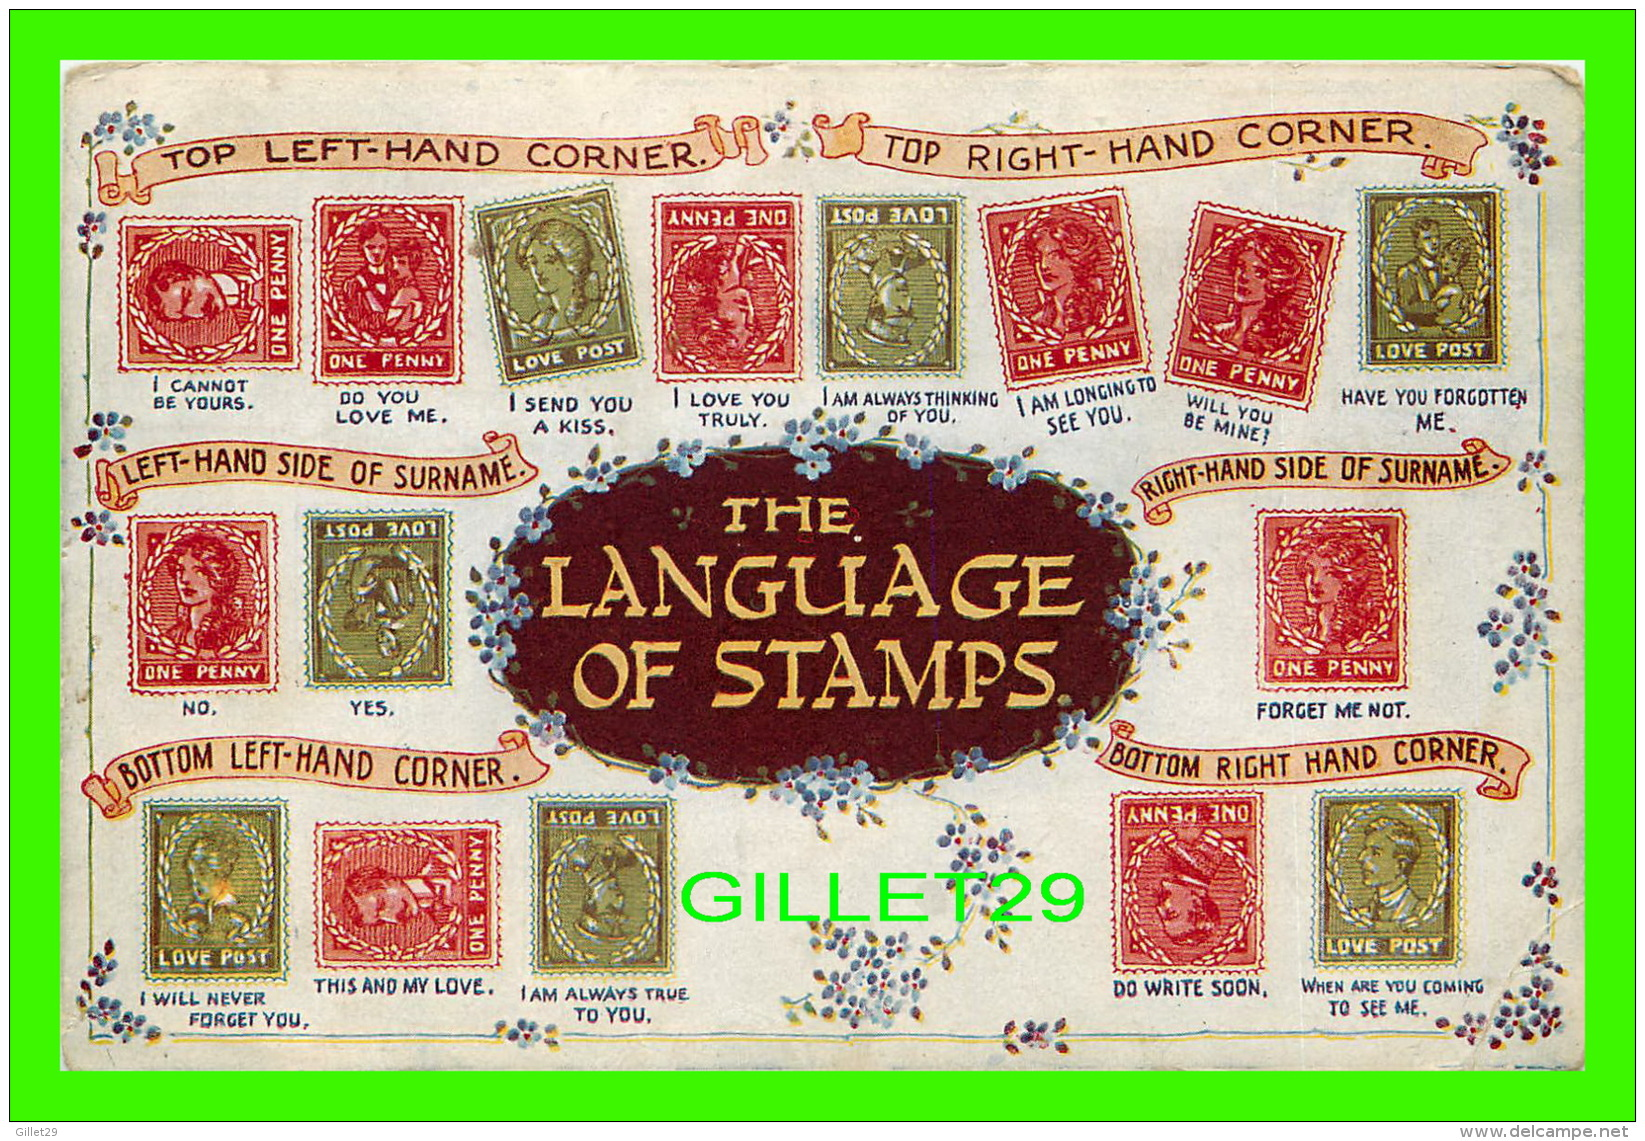 LONDON, UK - THE LANGUAGE OF STAMPS - THE REGENT PUBLISHING CO LTD - - London